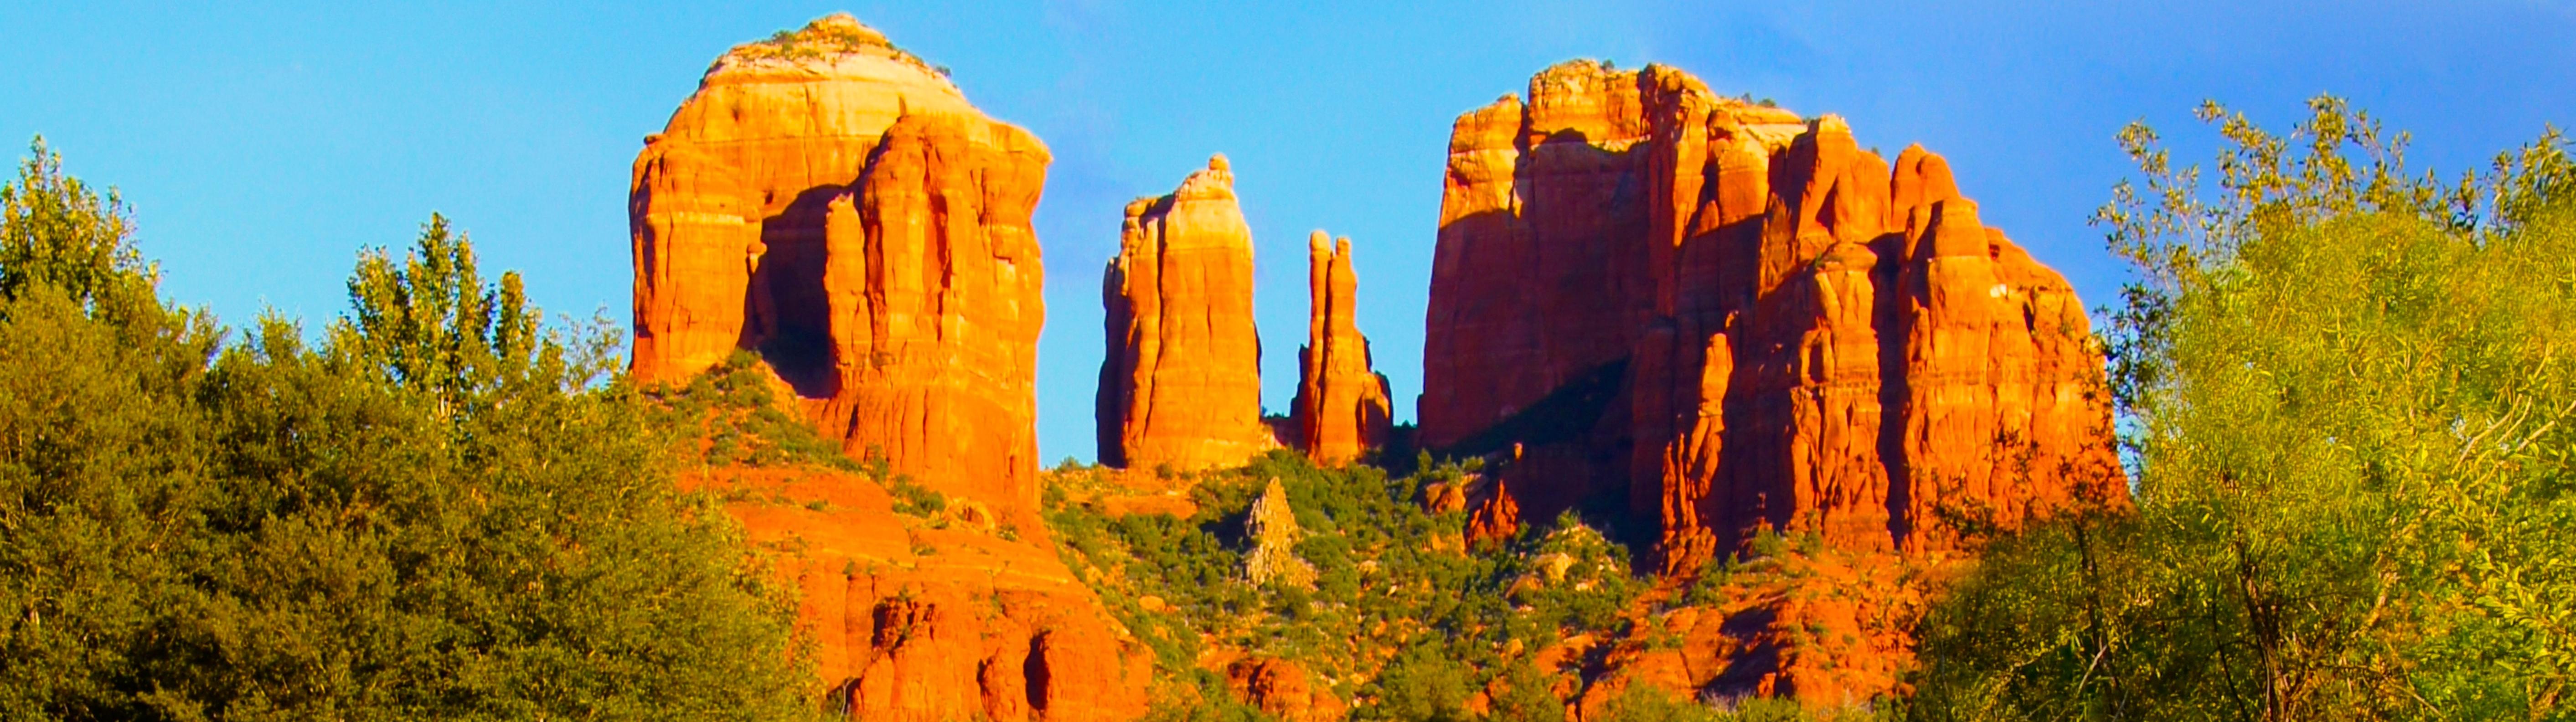 Travel Rn Jobs Arizona